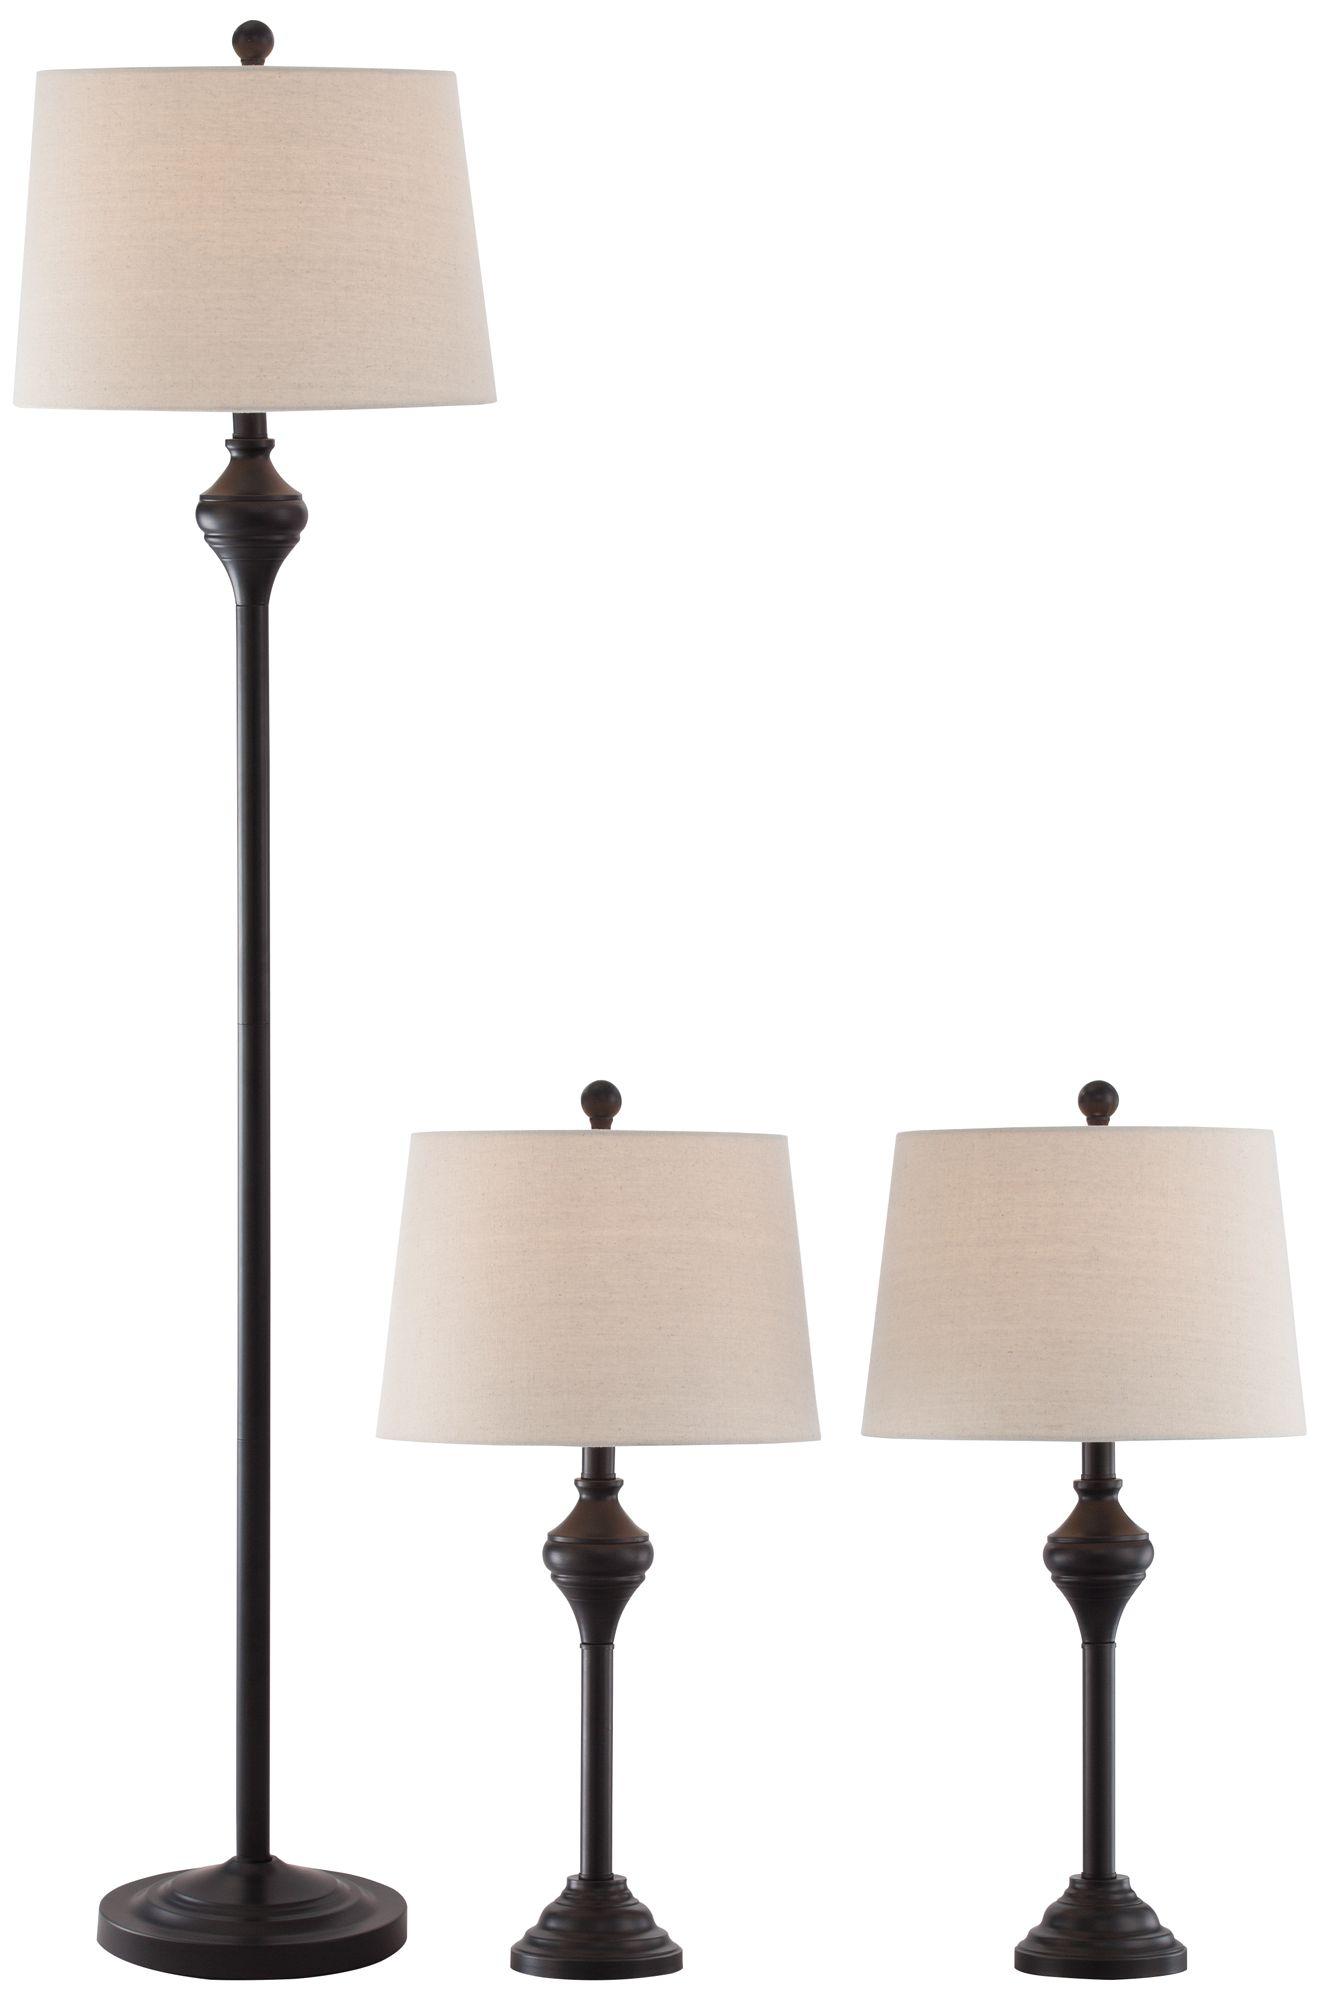 Mason Bronze Floor and Table L& Set of 3  sc 1 st  L&s Plus & Mason Bronze Floor and Table Lamp Set of 3 - #8N849 | Lamps Plus